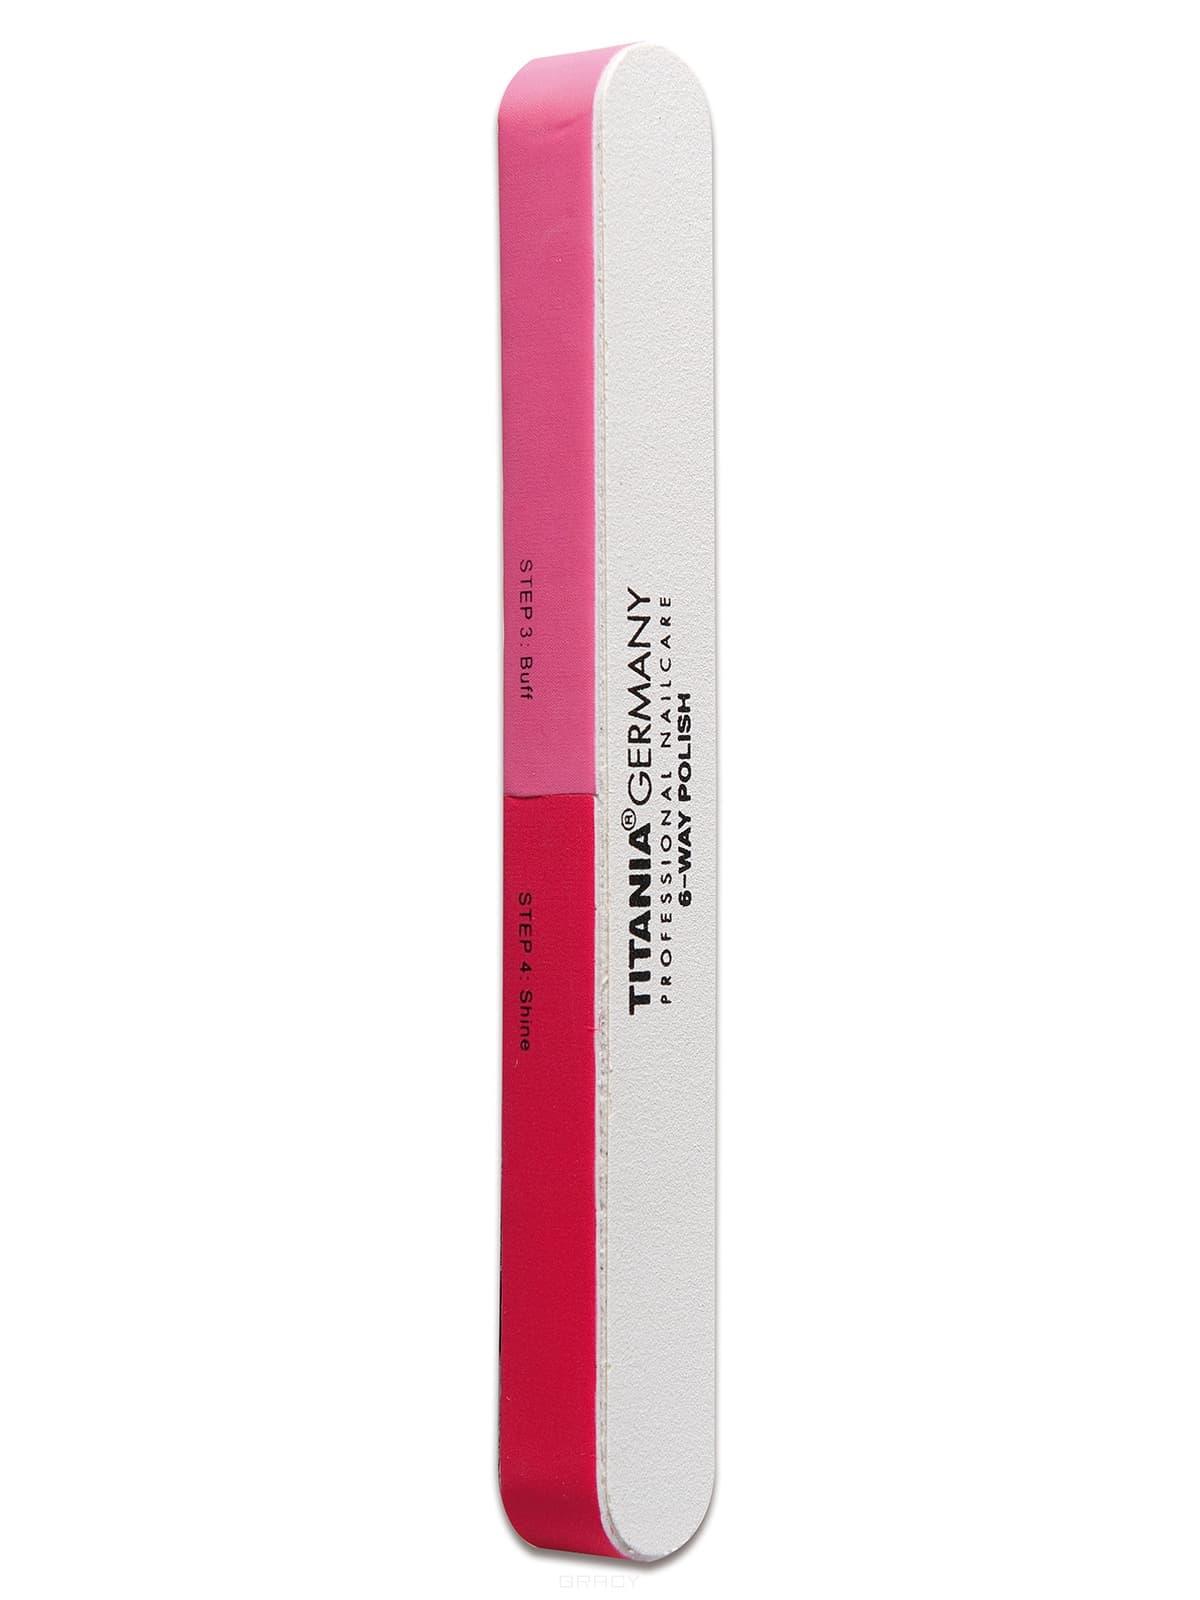 Titania Полировочная пилка 6-ти сторонняя 1038 cnd пилка 3 х сторонняя полировочная тонкая 4 way